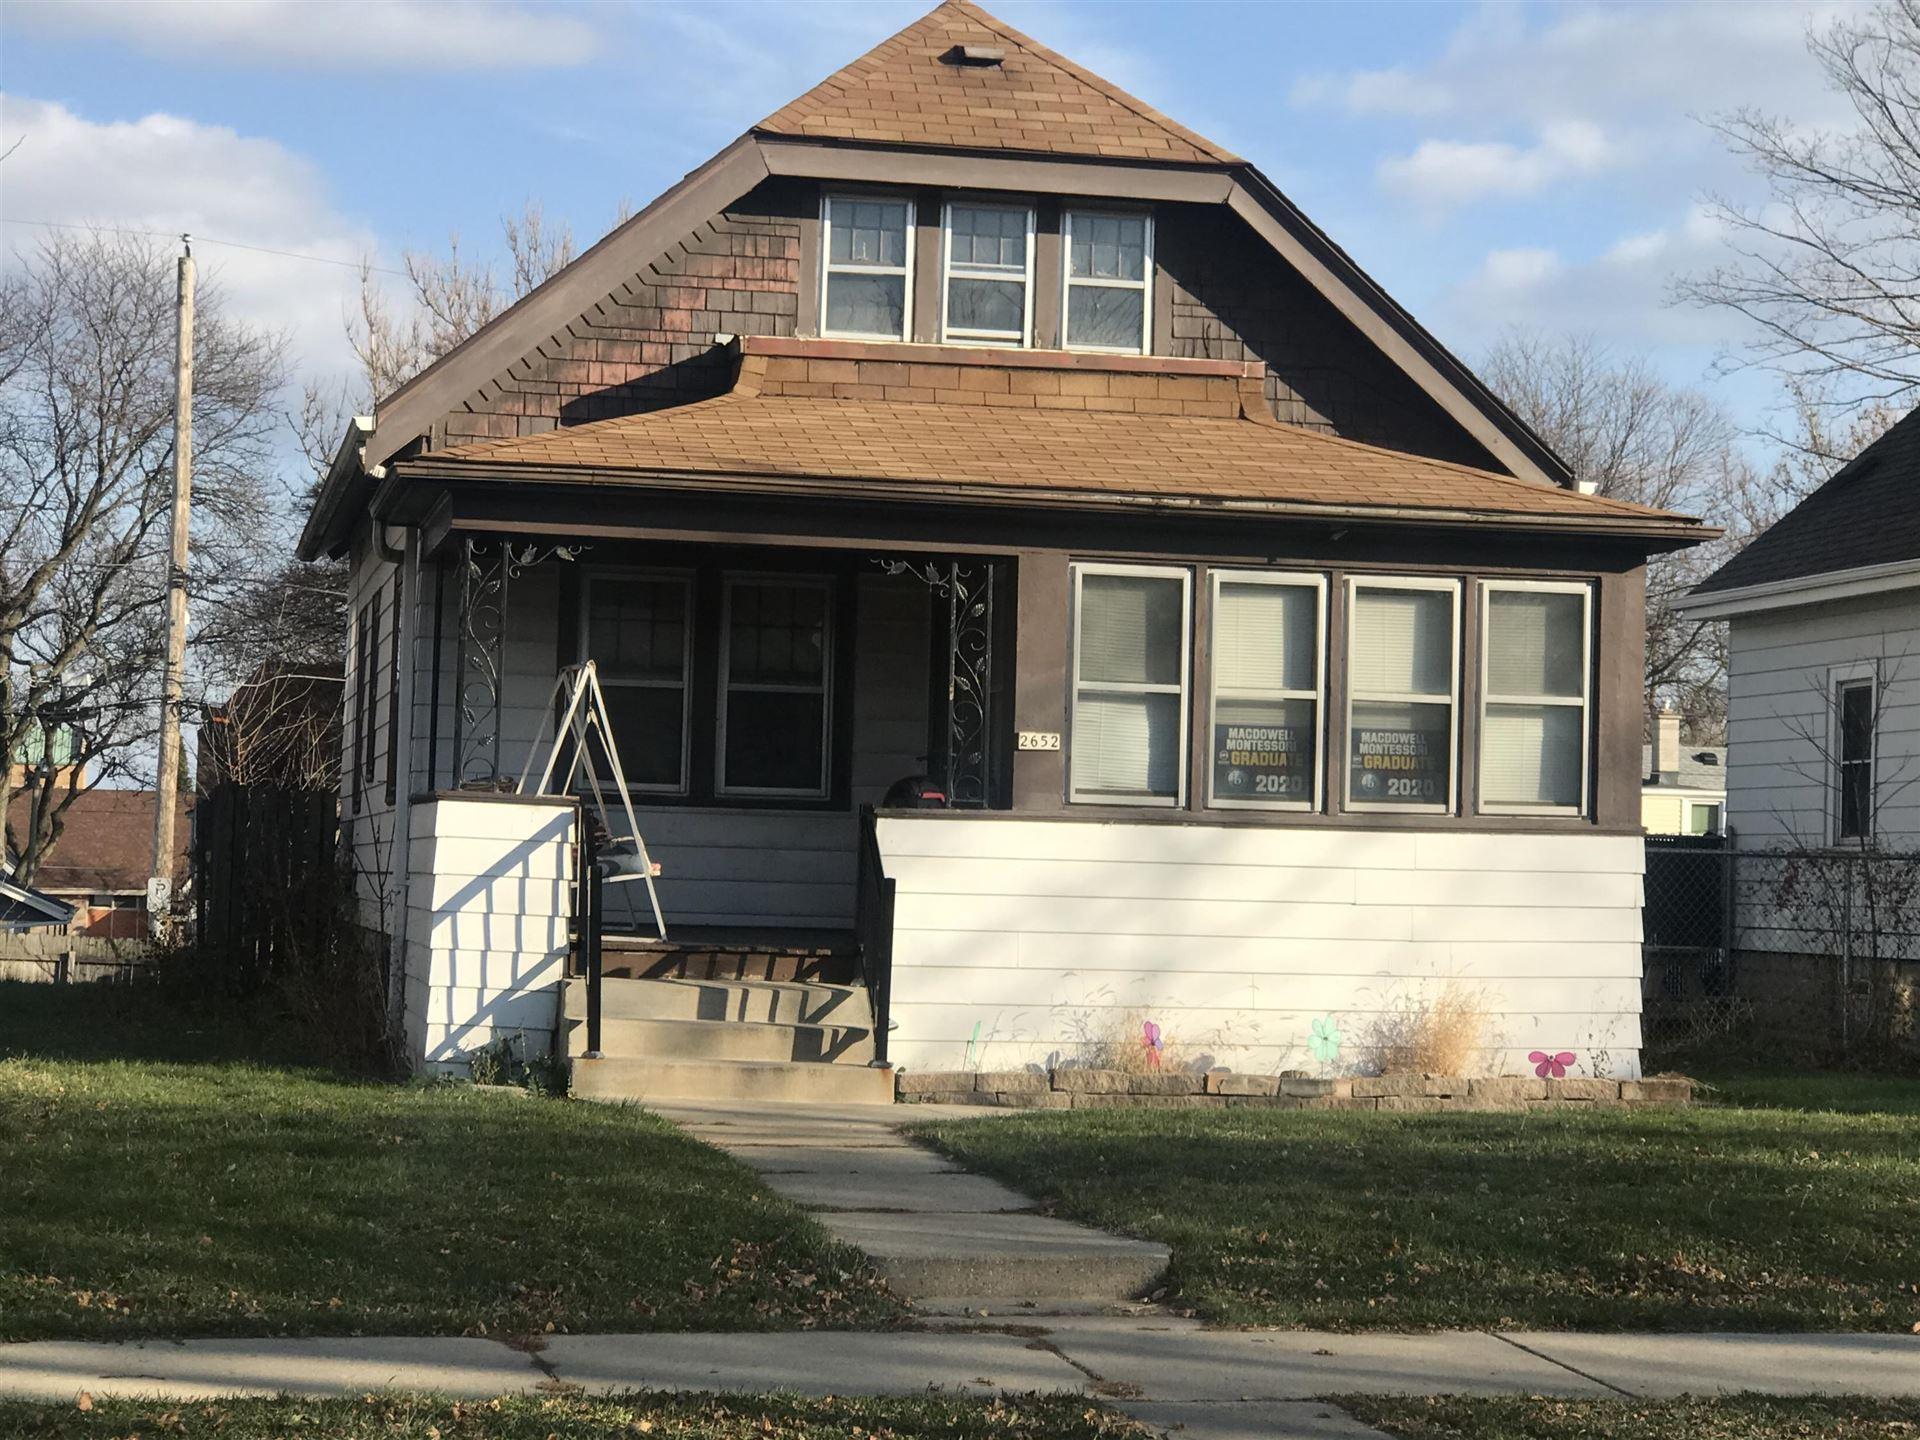 2652 N 55th St, Milwaukee, WI 53210 - #: 1719703